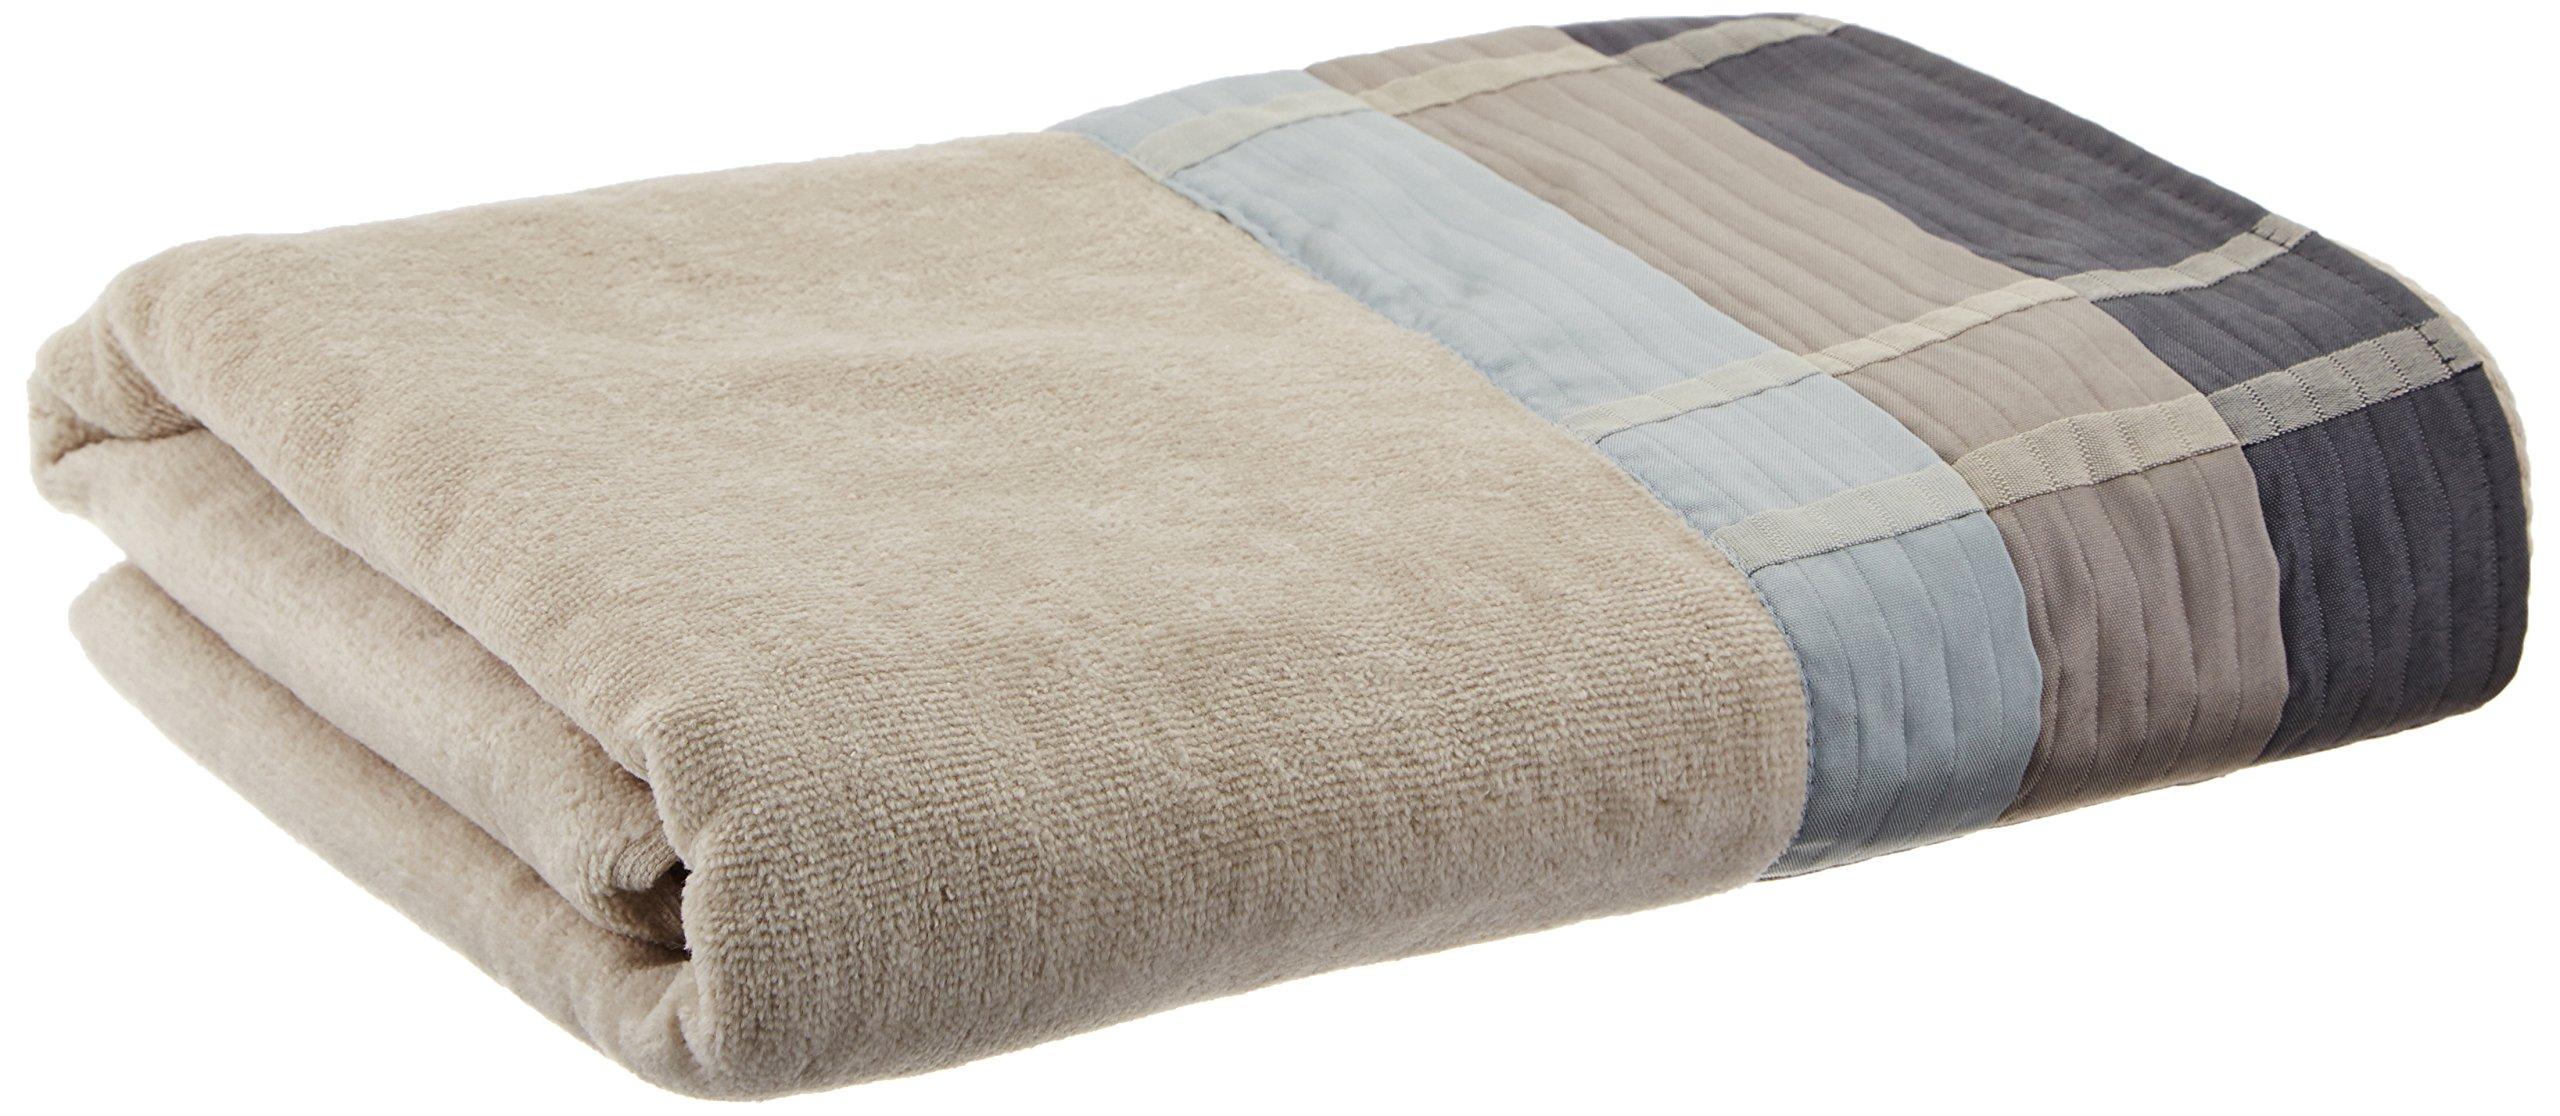 Croscill Fairfax Hand Towel, 16 by 28-Inch, Slate